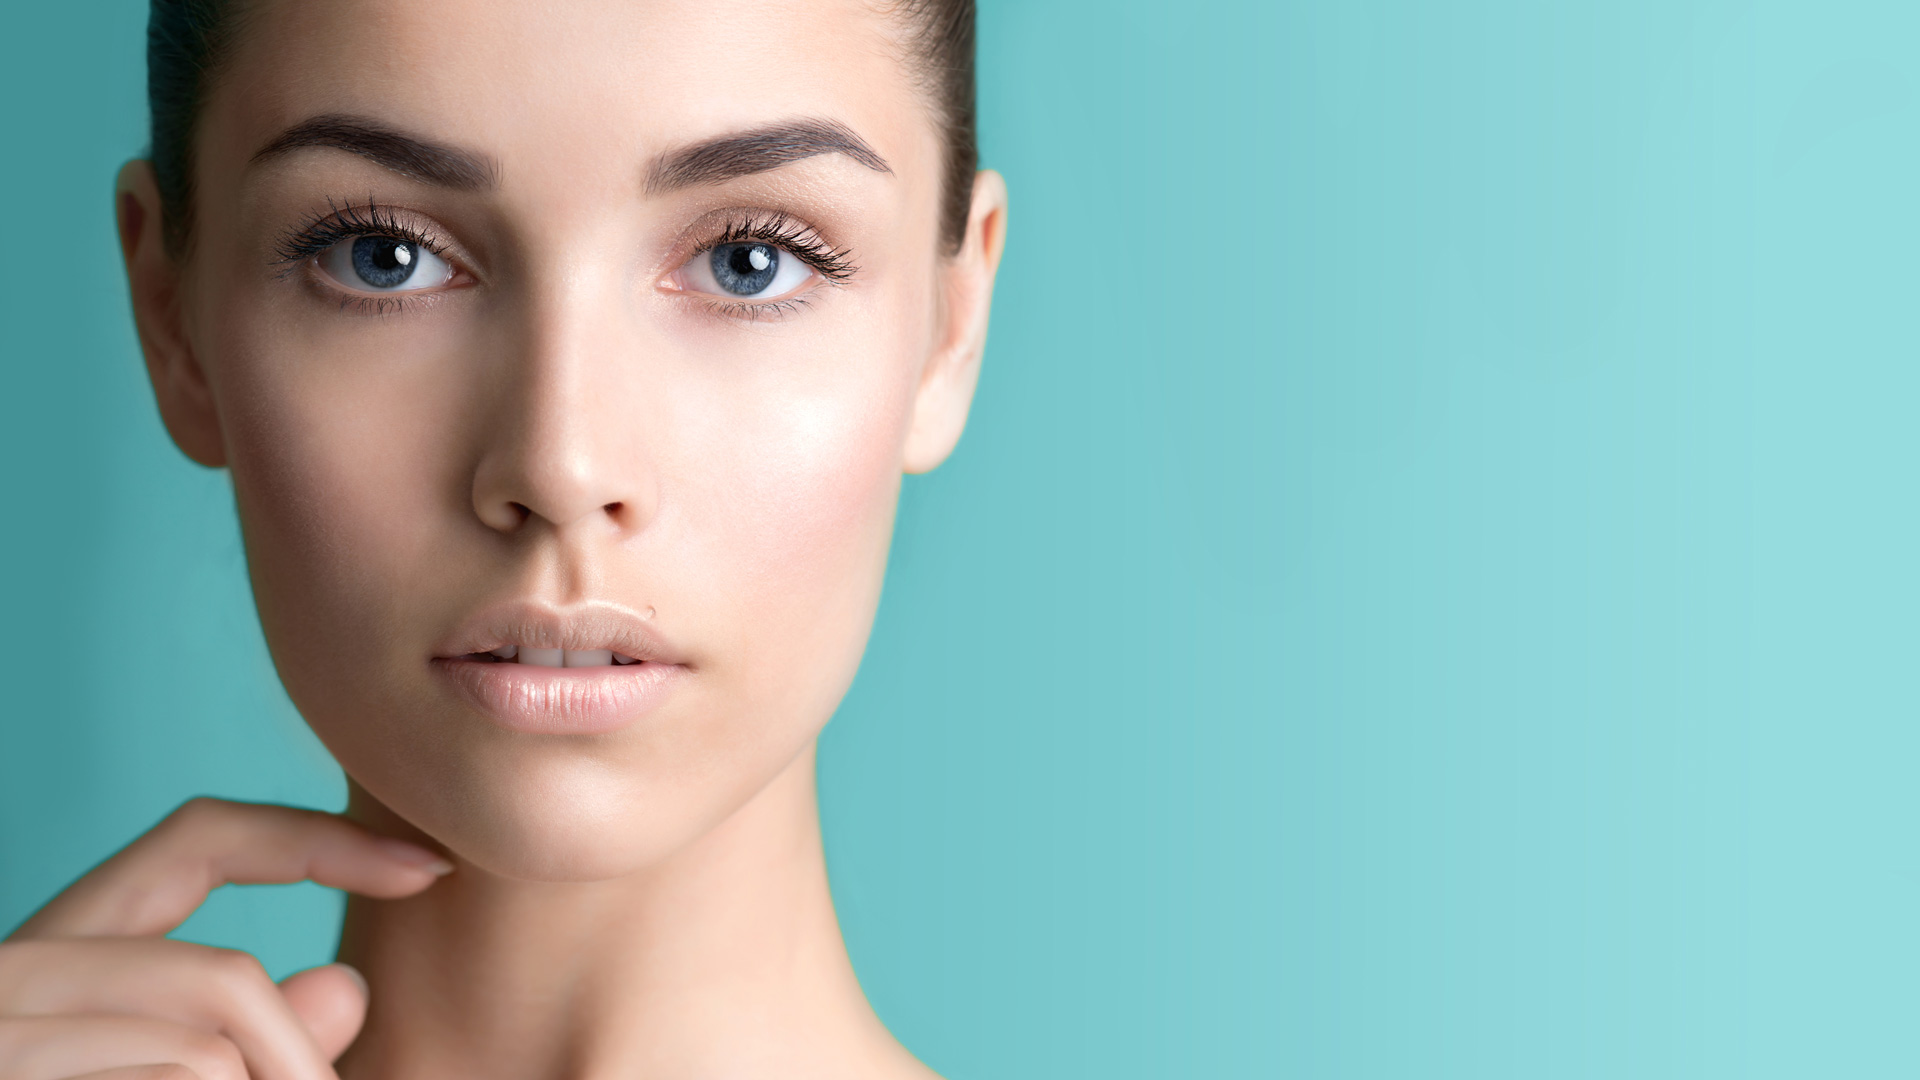 De ce ingrijirea pielii este importanta